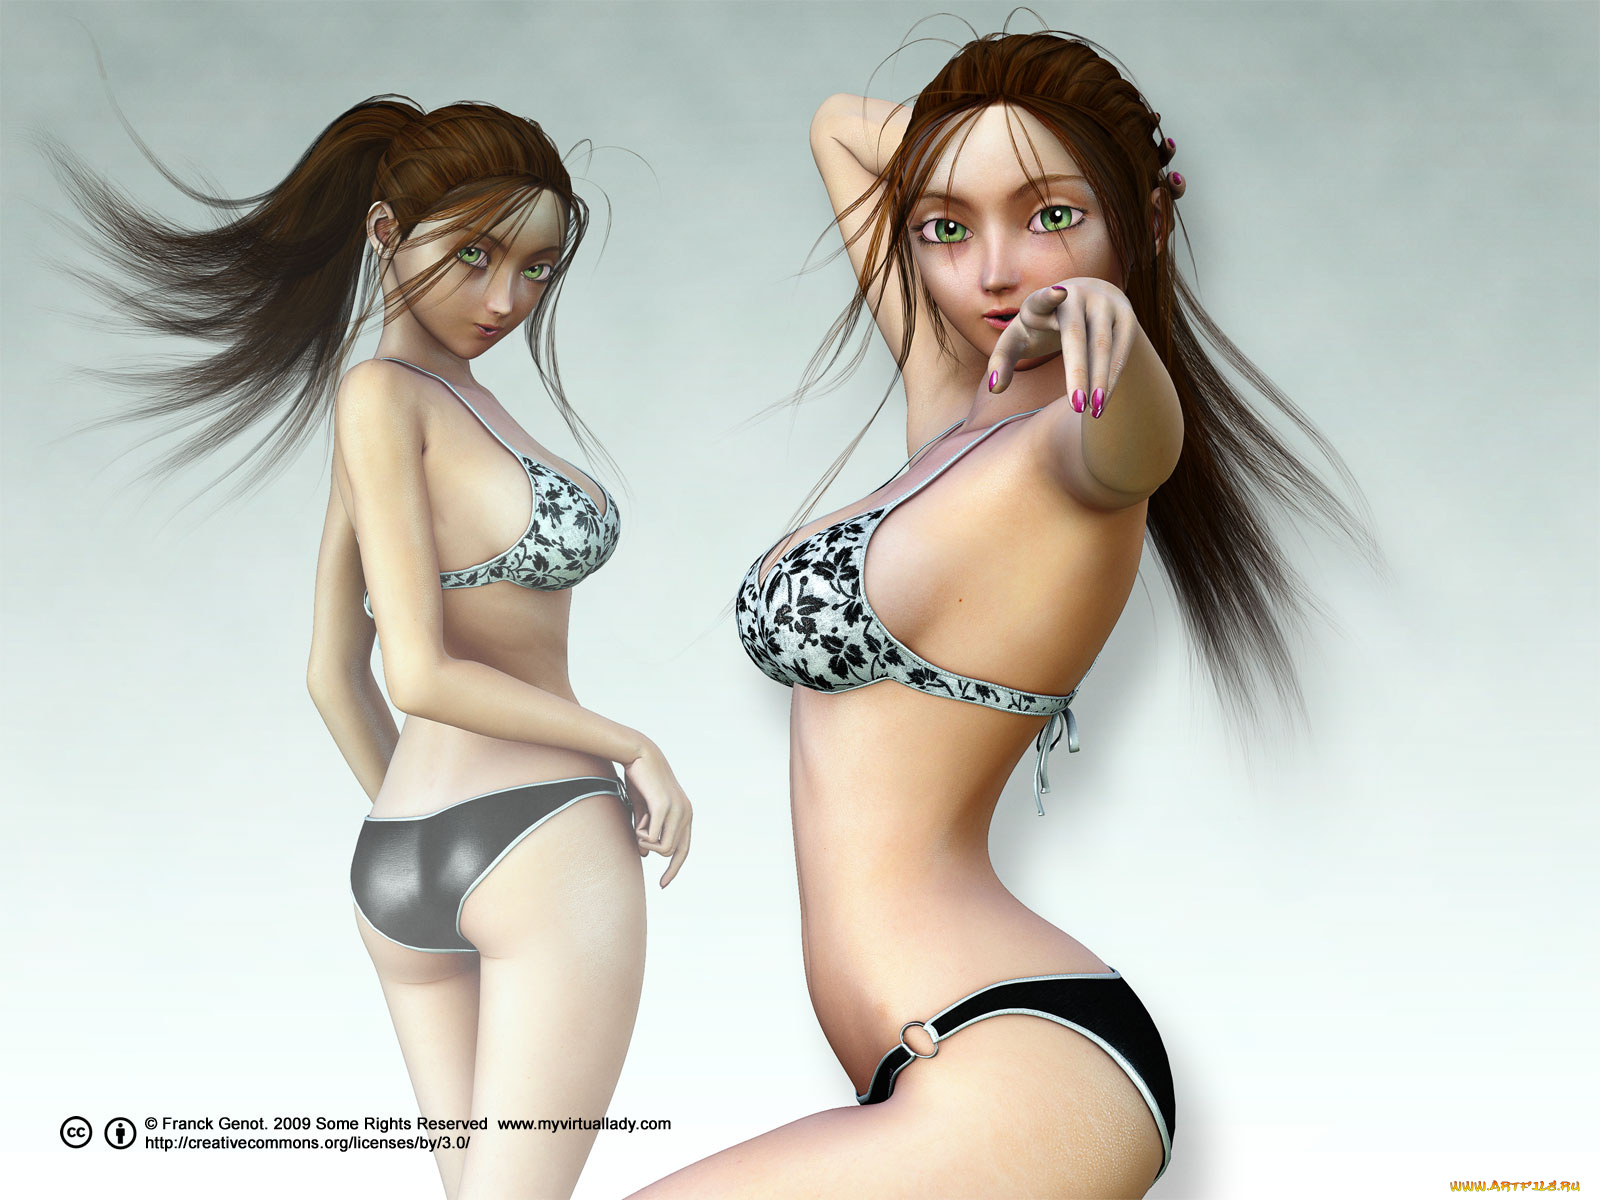 Most realistic virtual animation porn comics